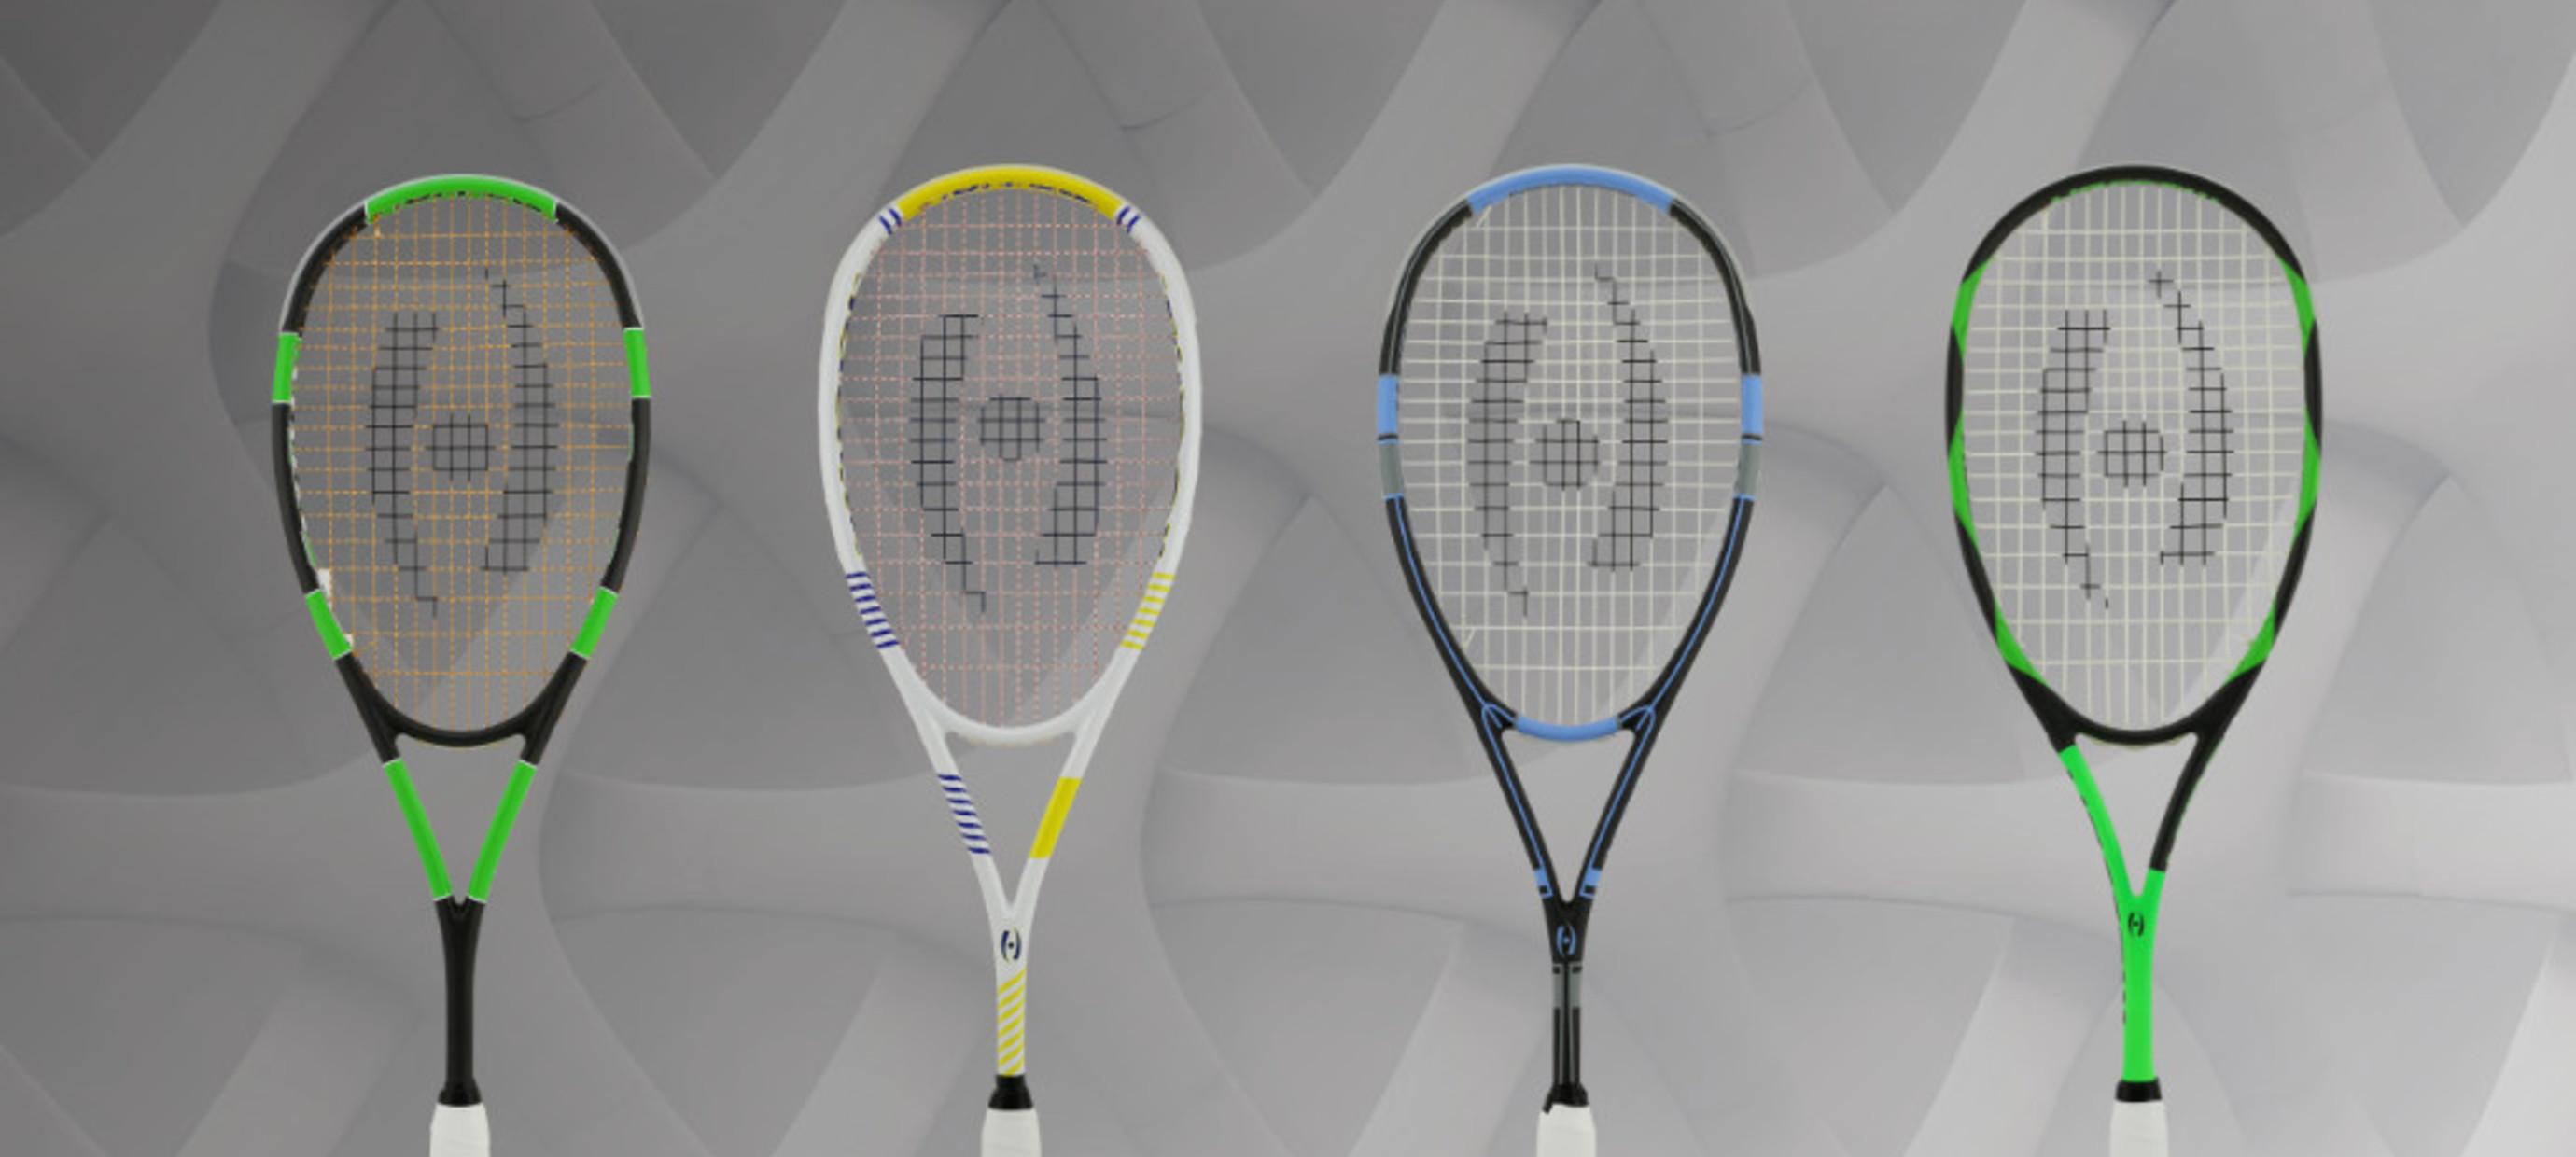 Harrow - the Ferrari of the squash rackets